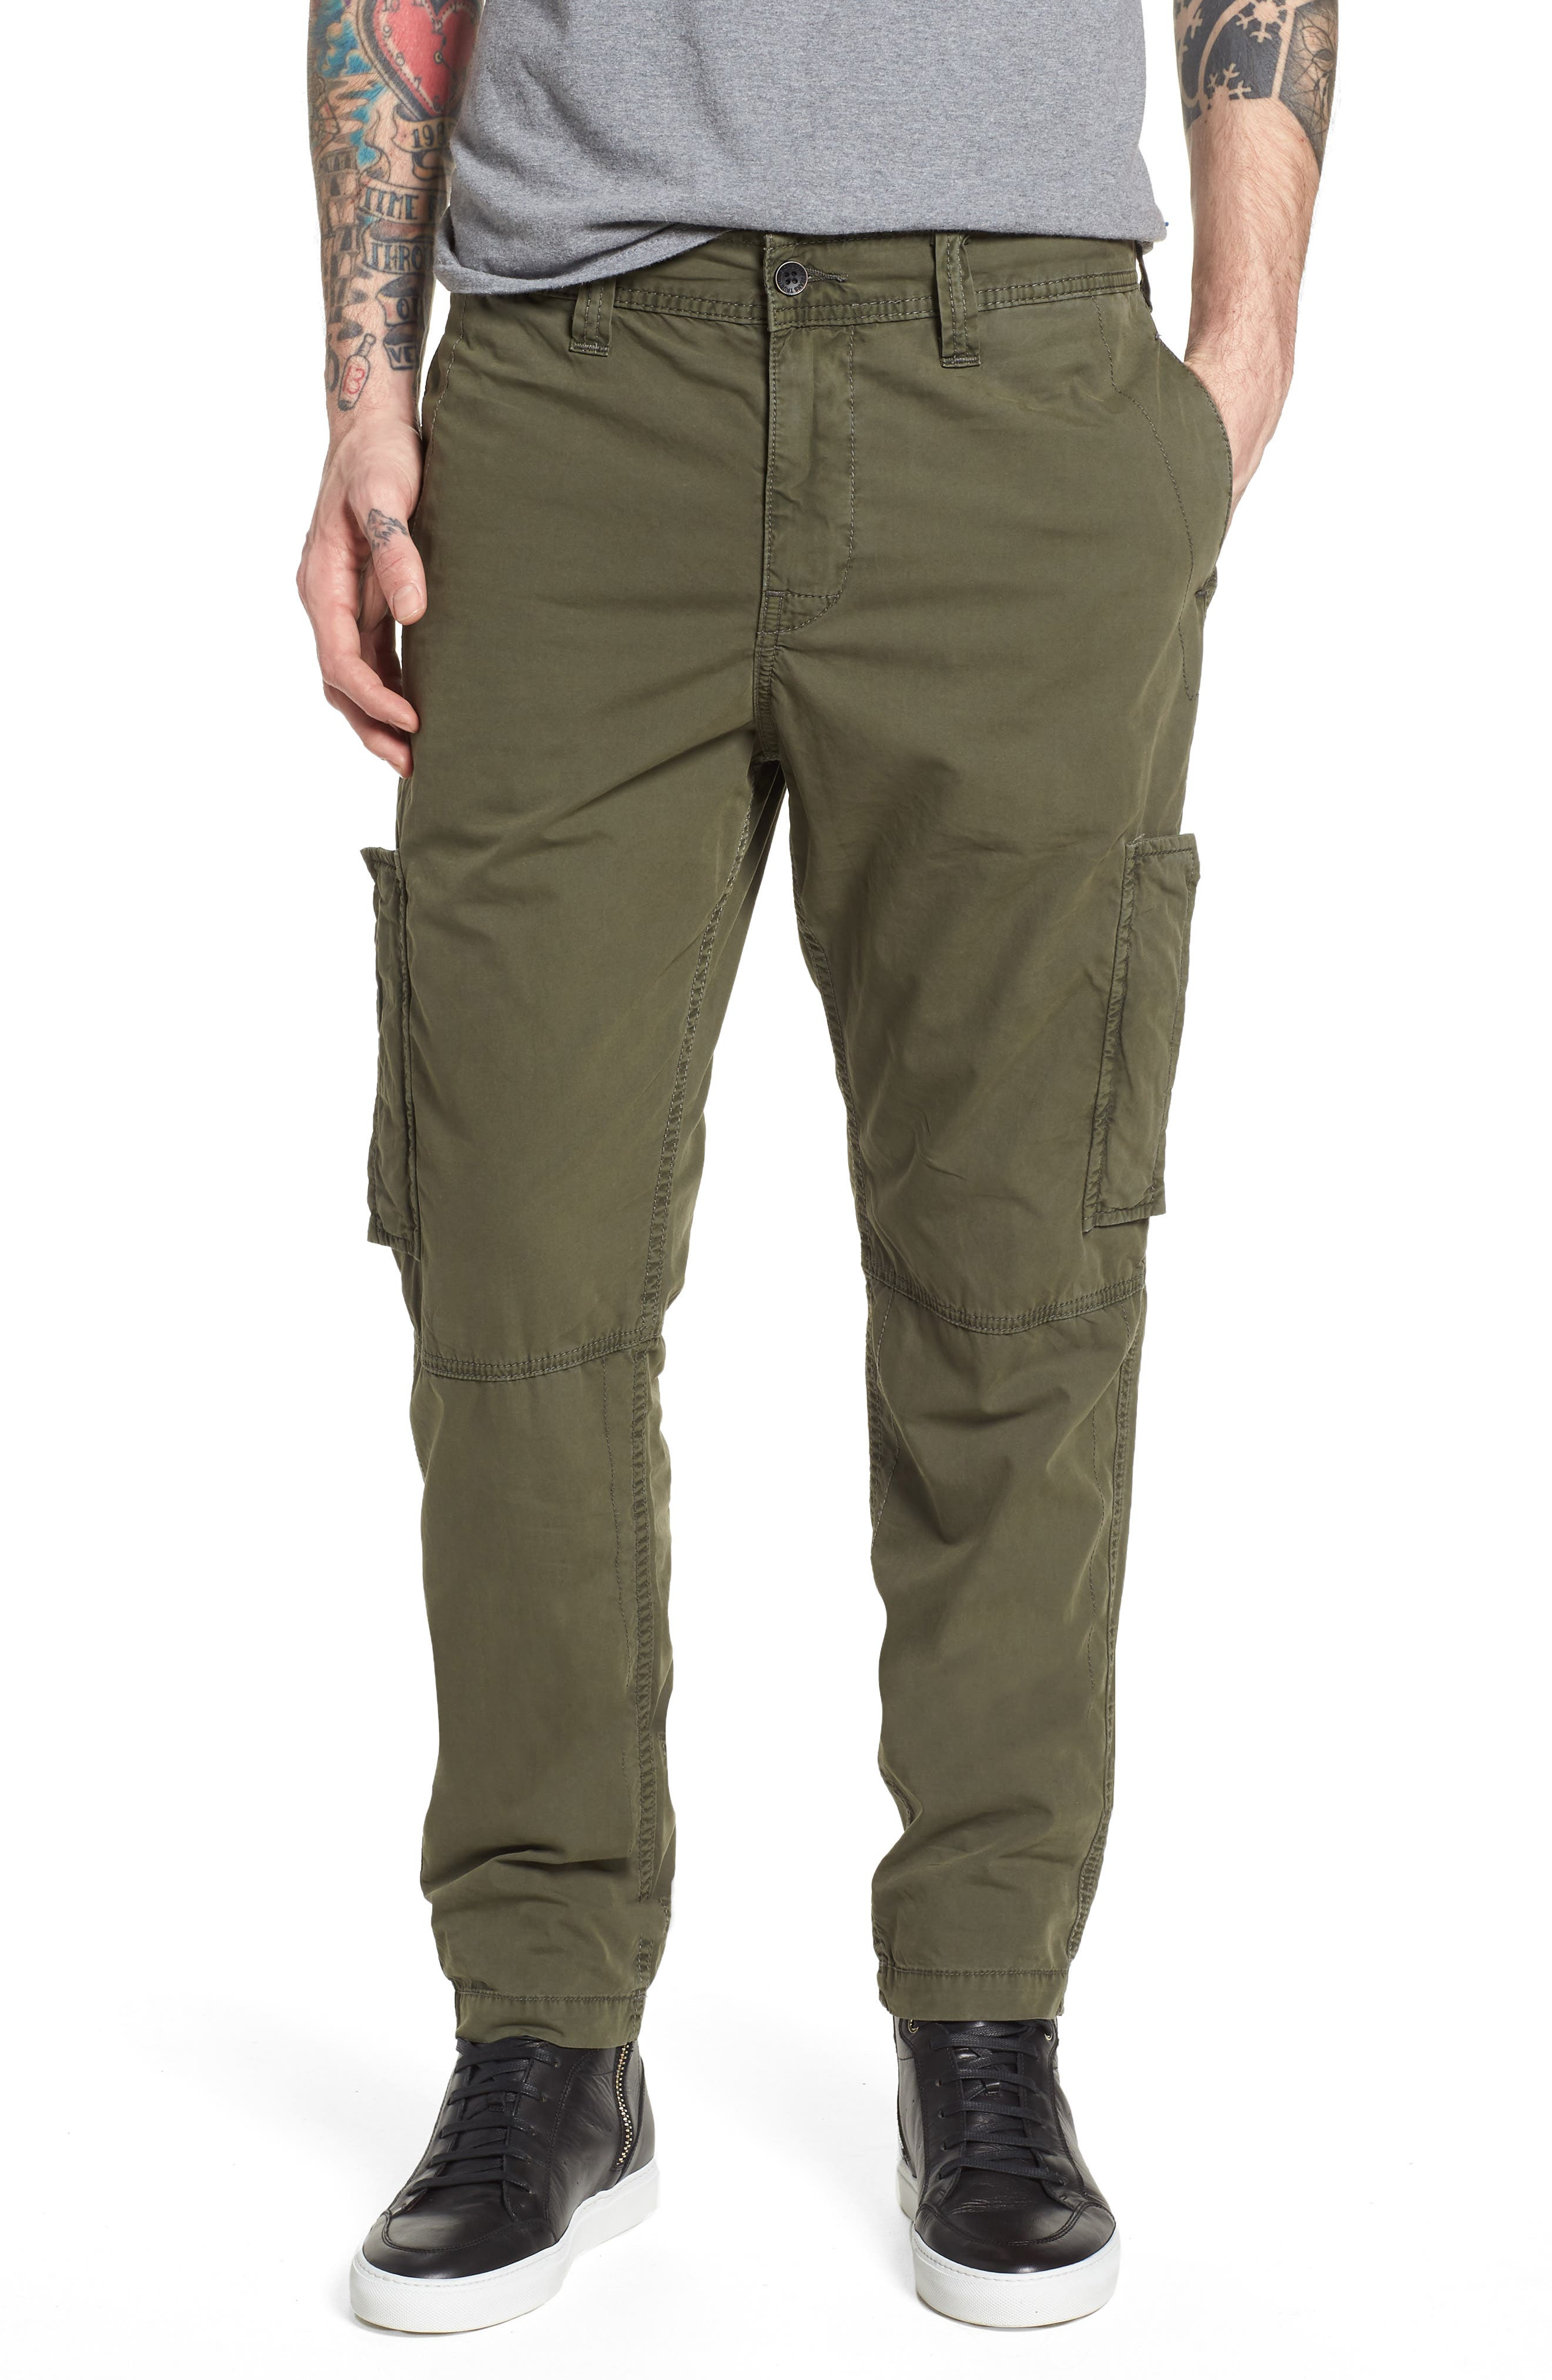 Officer Field Pants,                             Main thumbnail 1, color,                             Epj Militant Green